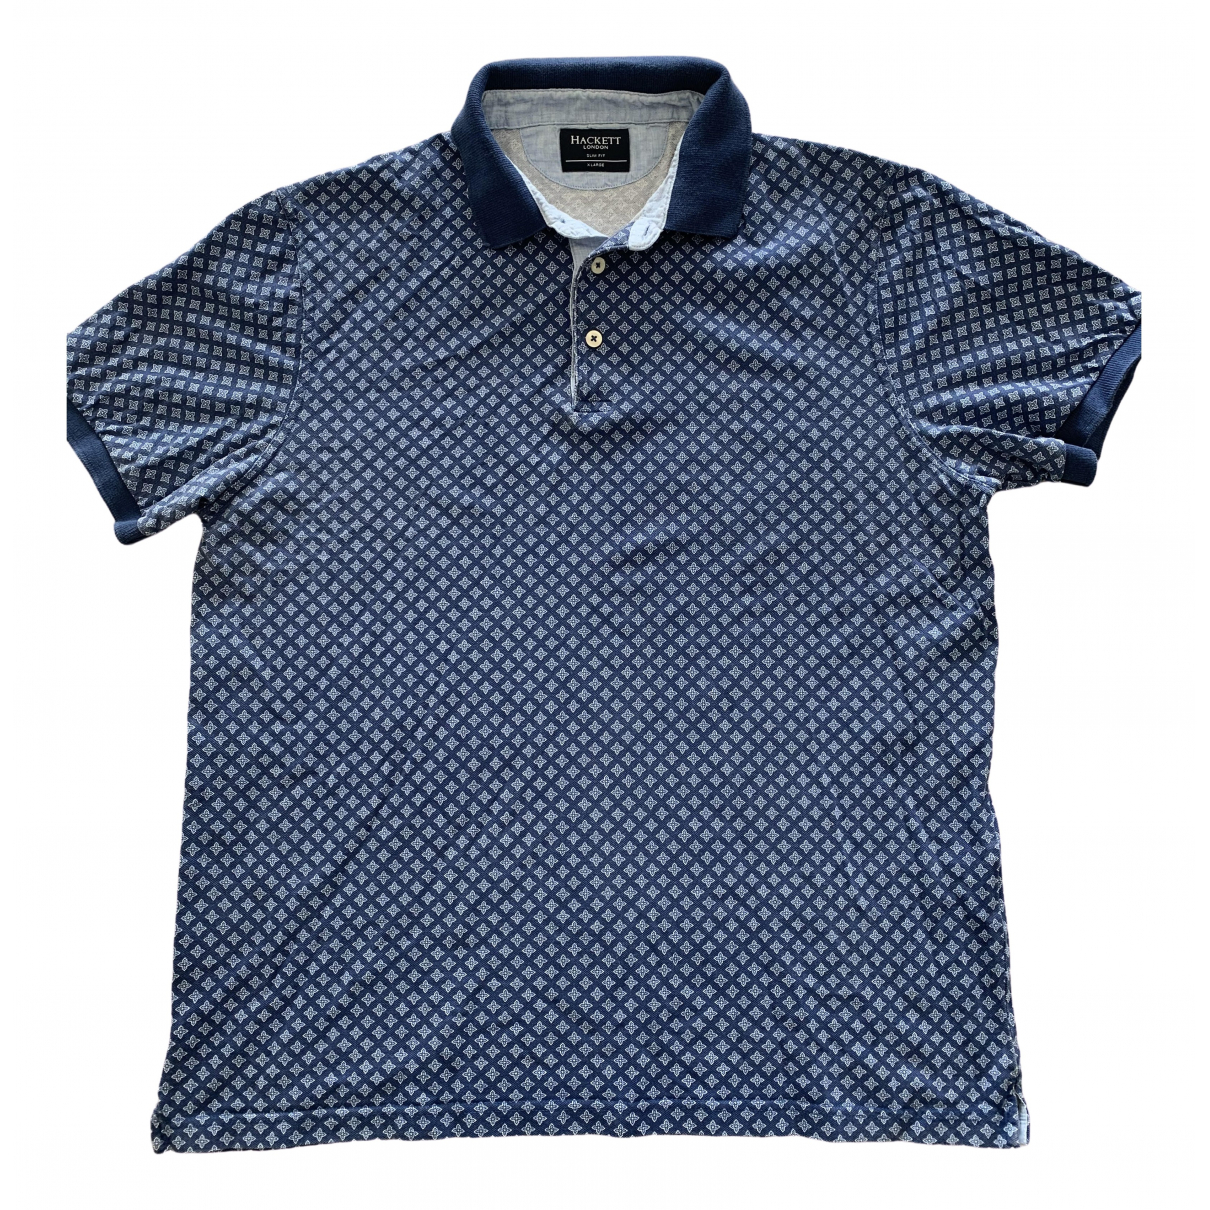 Hackett London \N Poloshirts in  Blau Baumwolle